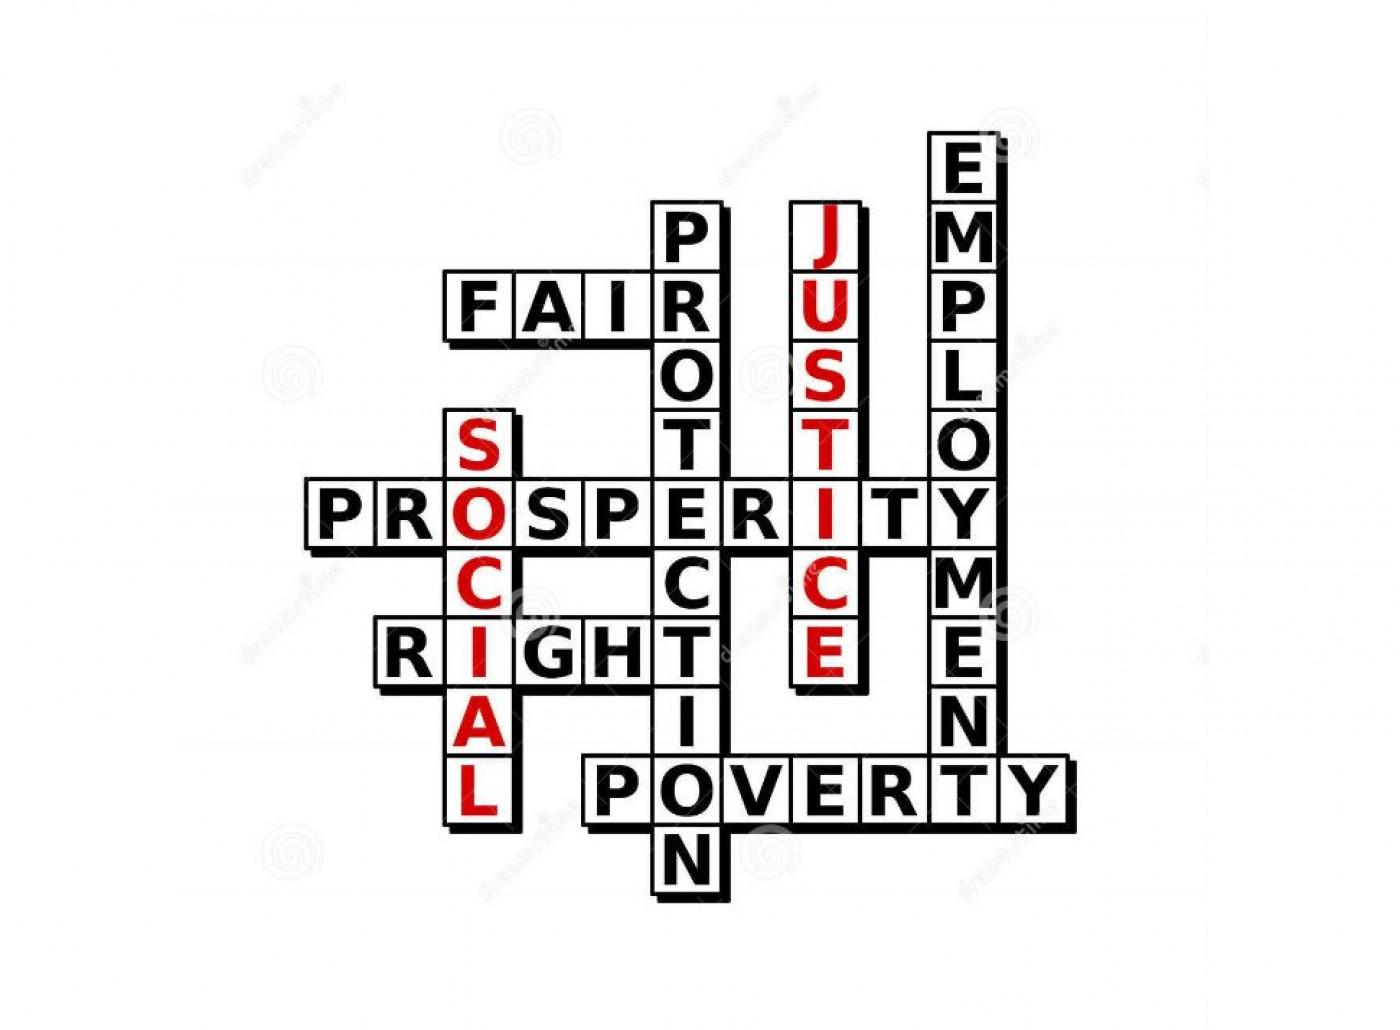 003 Surprising Prosperity Crossword Photo  Sound Clue Material1400